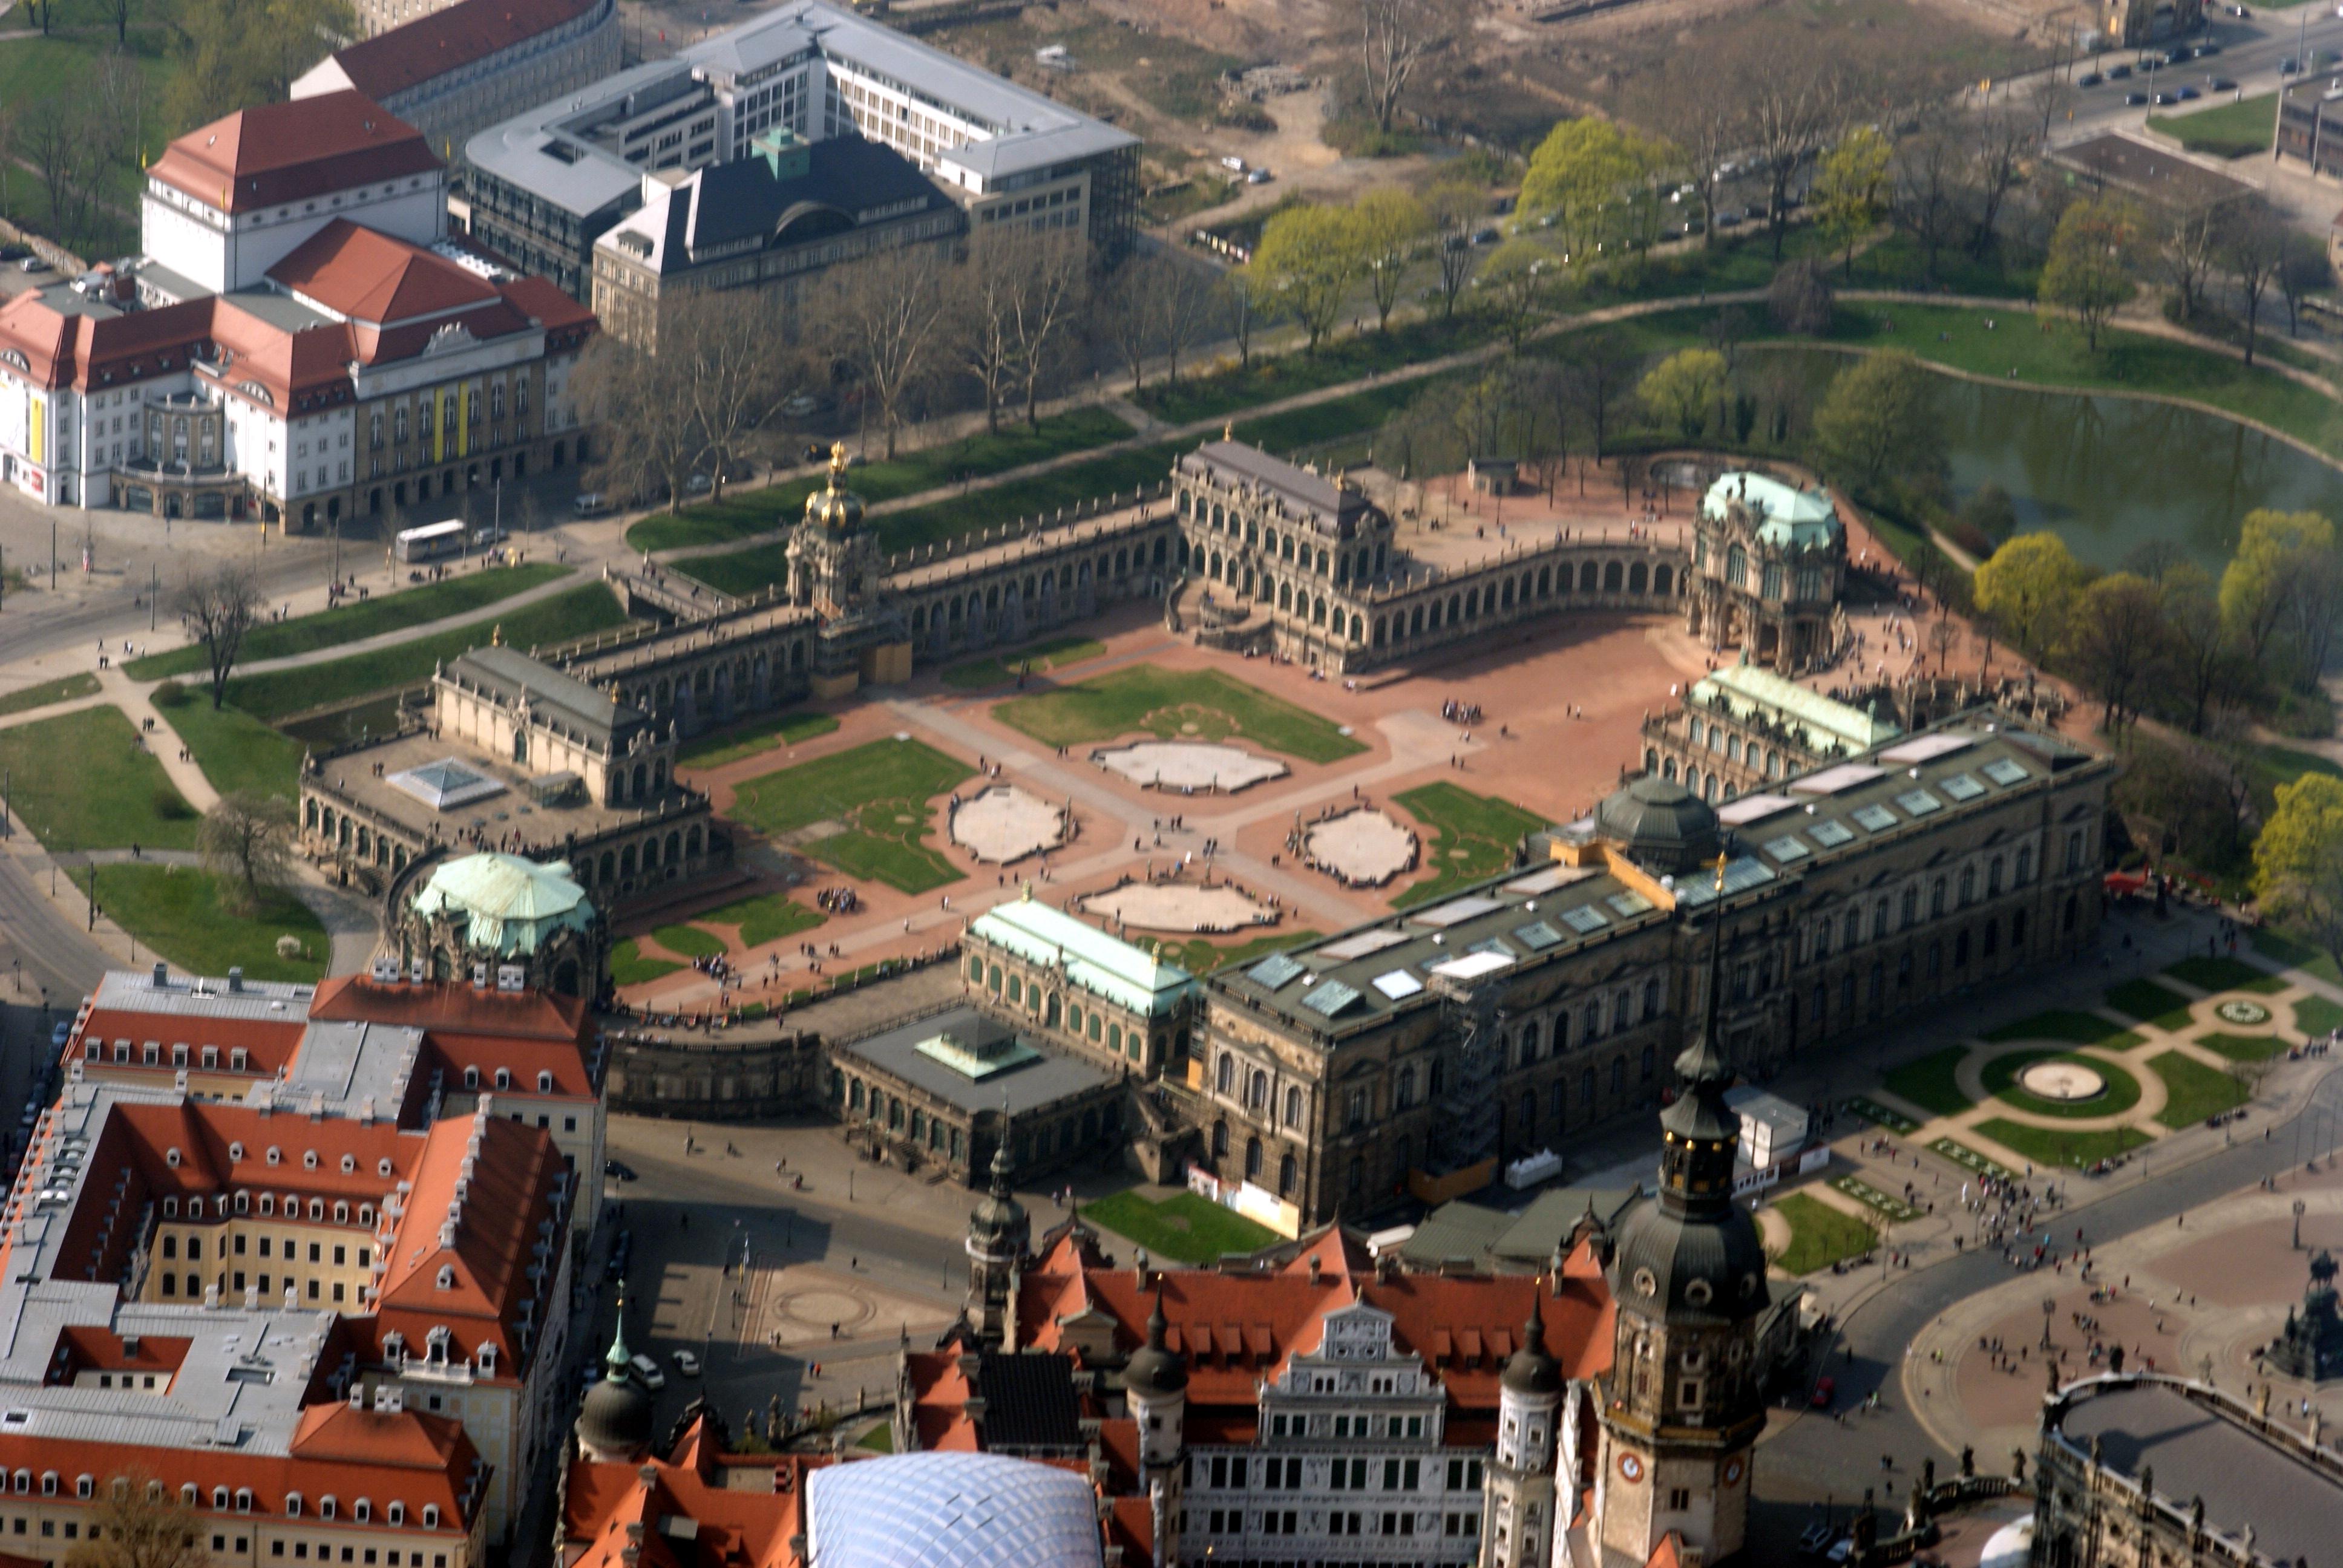 https://upload.wikimedia.org/wikipedia/commons/5/56/Luftbild_Zwinger_Dresden_2014-03-29.jpg